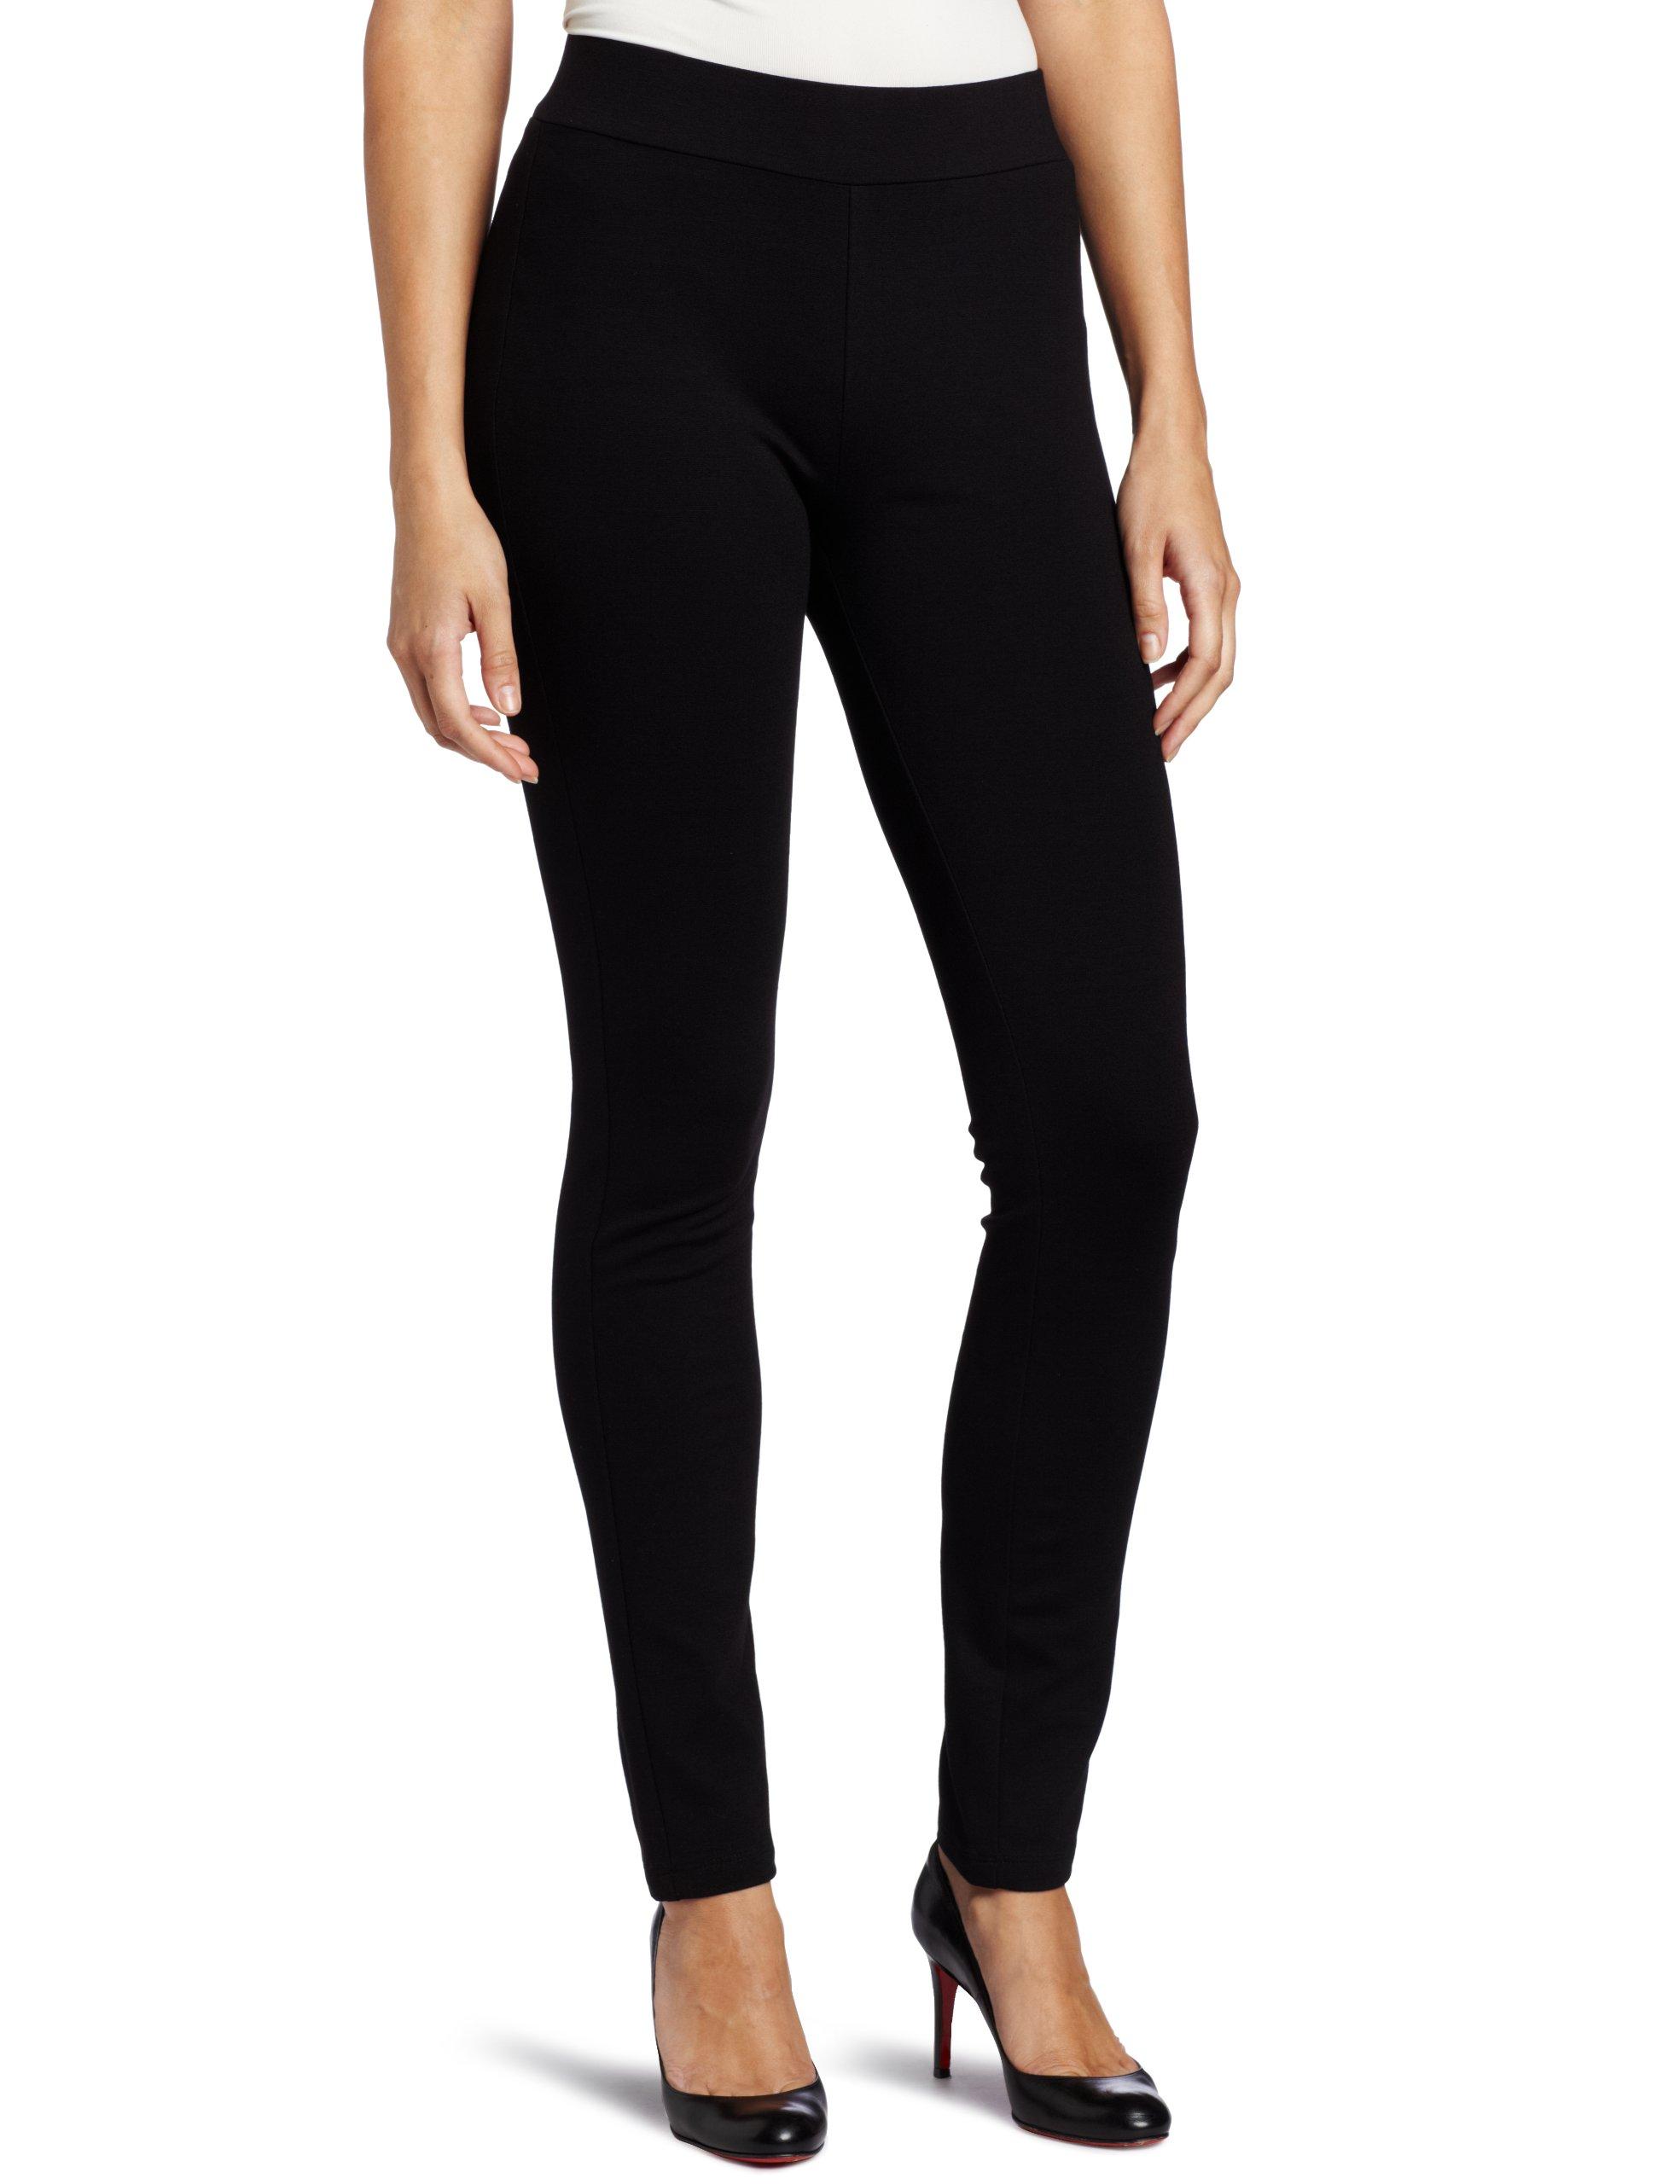 NYDJ Women's Petite Jodie Basic Ponte Pull On Legging, Black, 2P